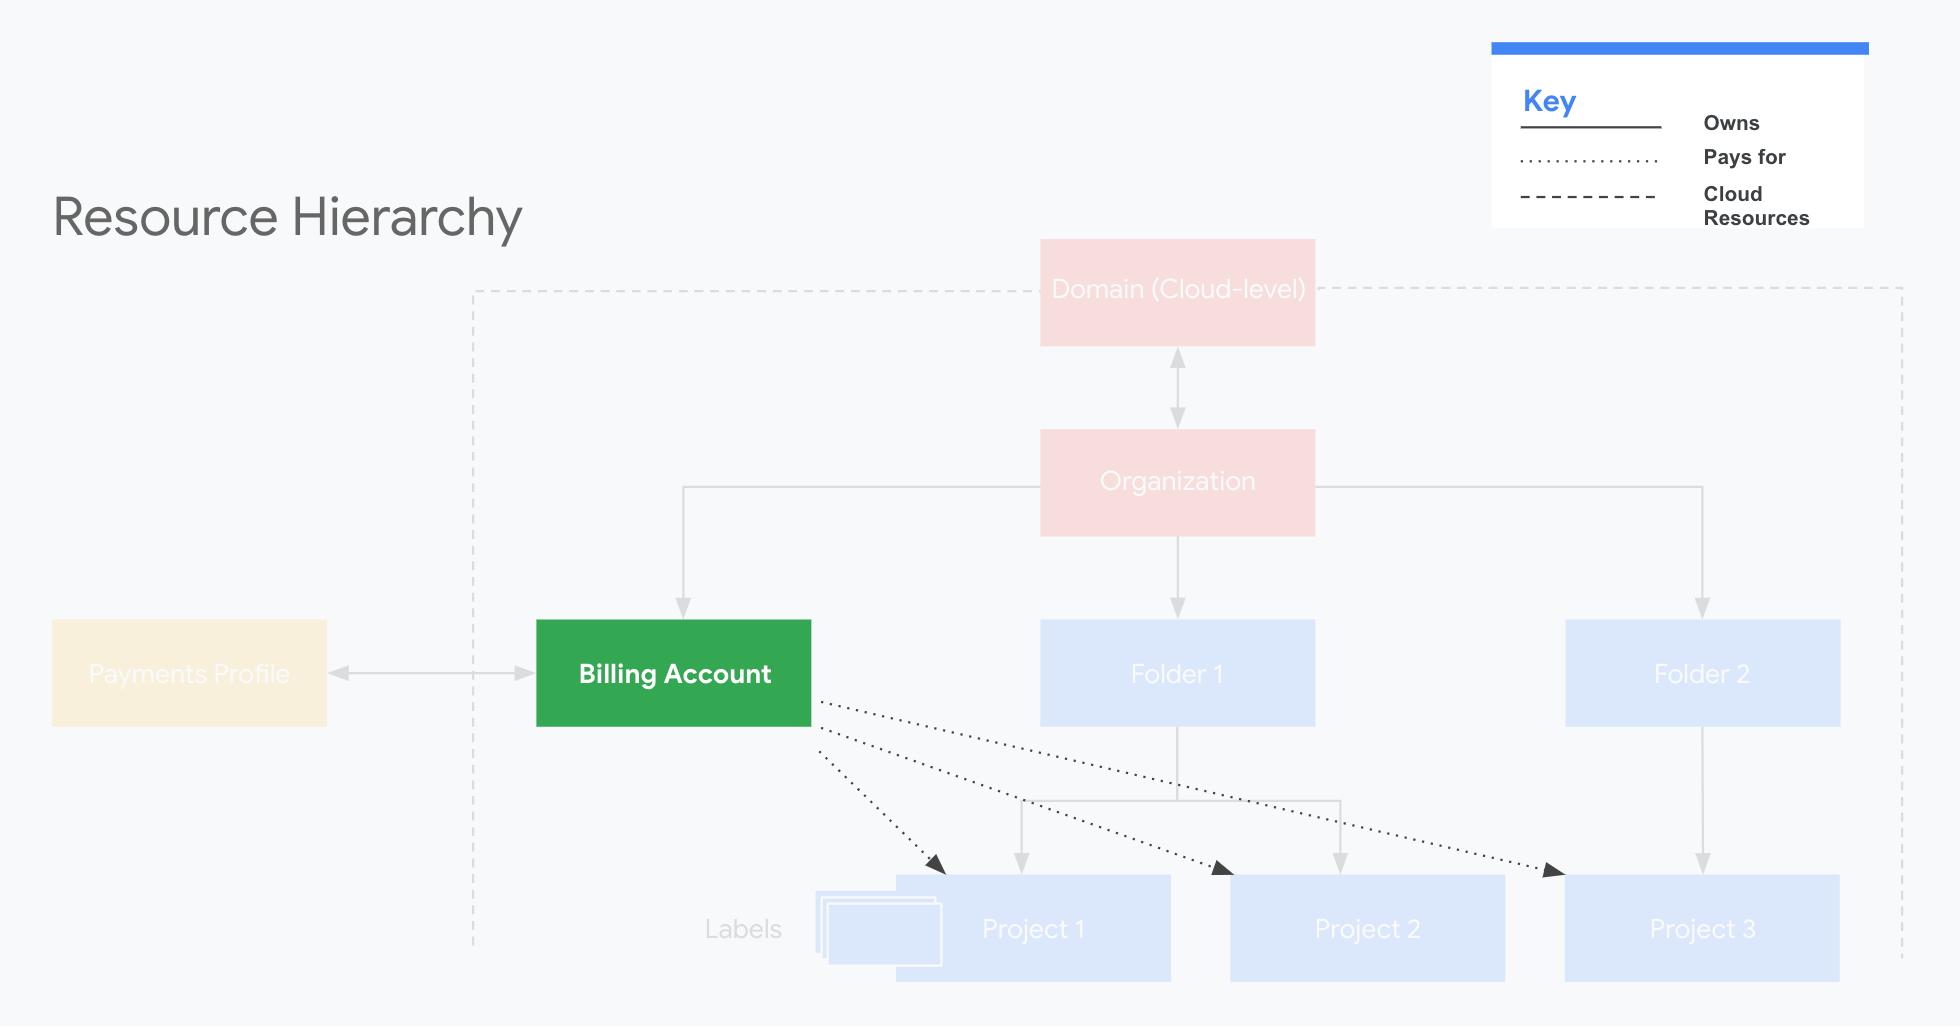 Contas do Cloud Billing na hierarquia de recursos